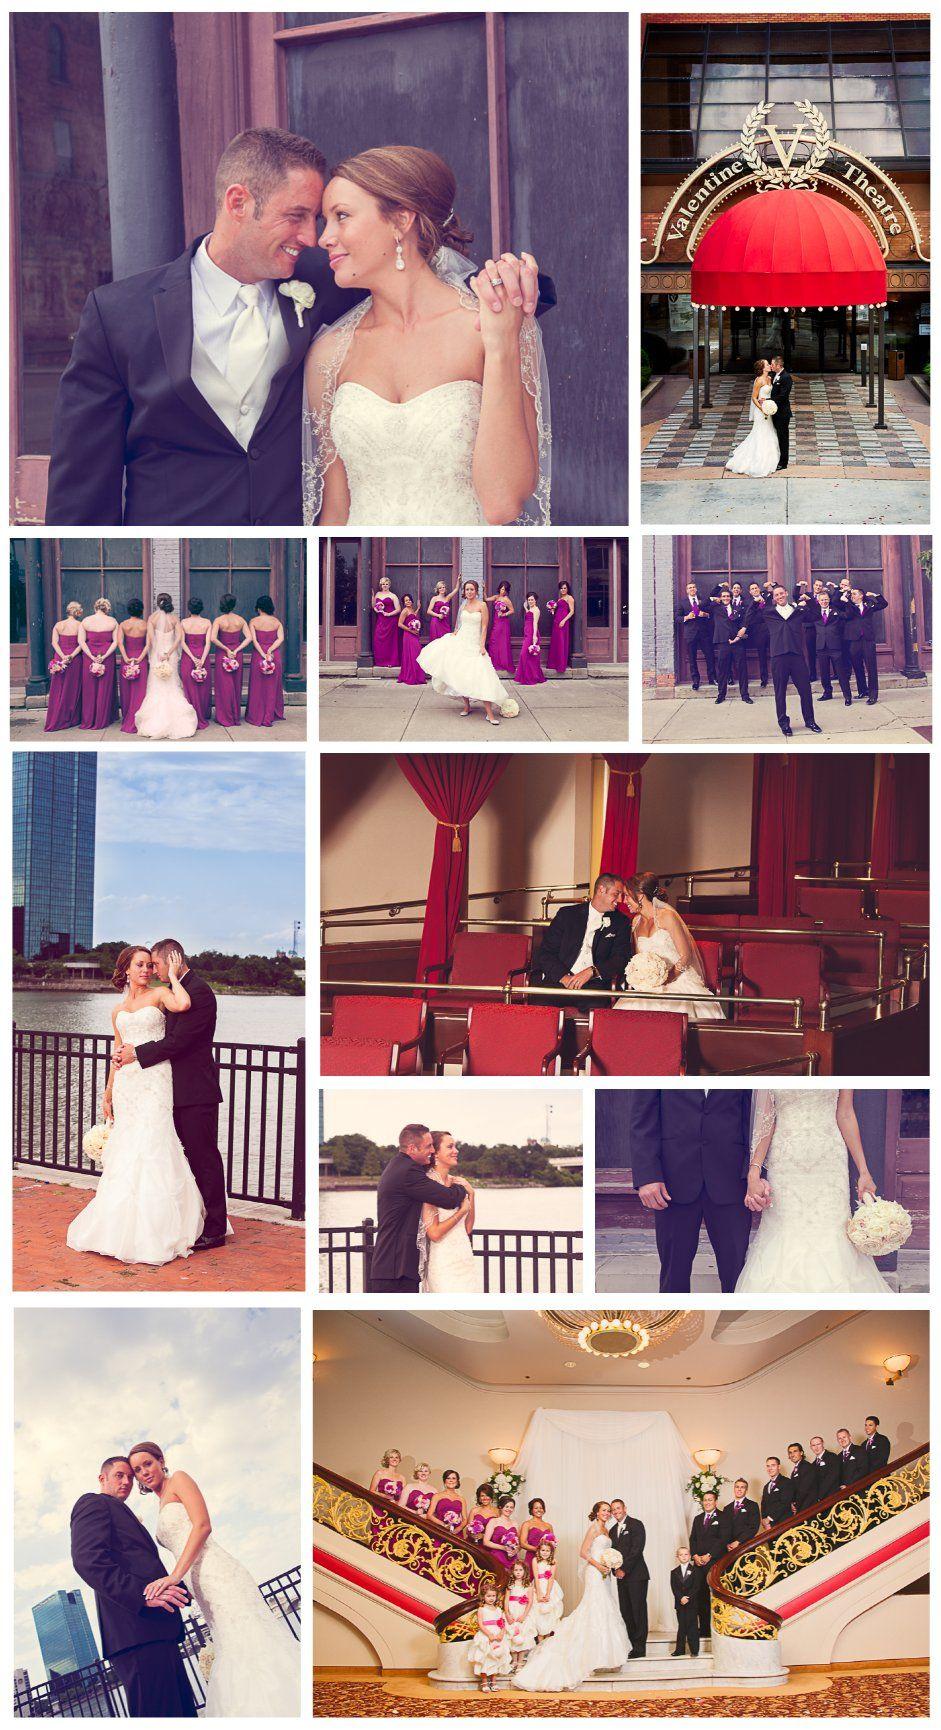 valentine theatre toledo ohio wedding party ideas memories captured by brenda